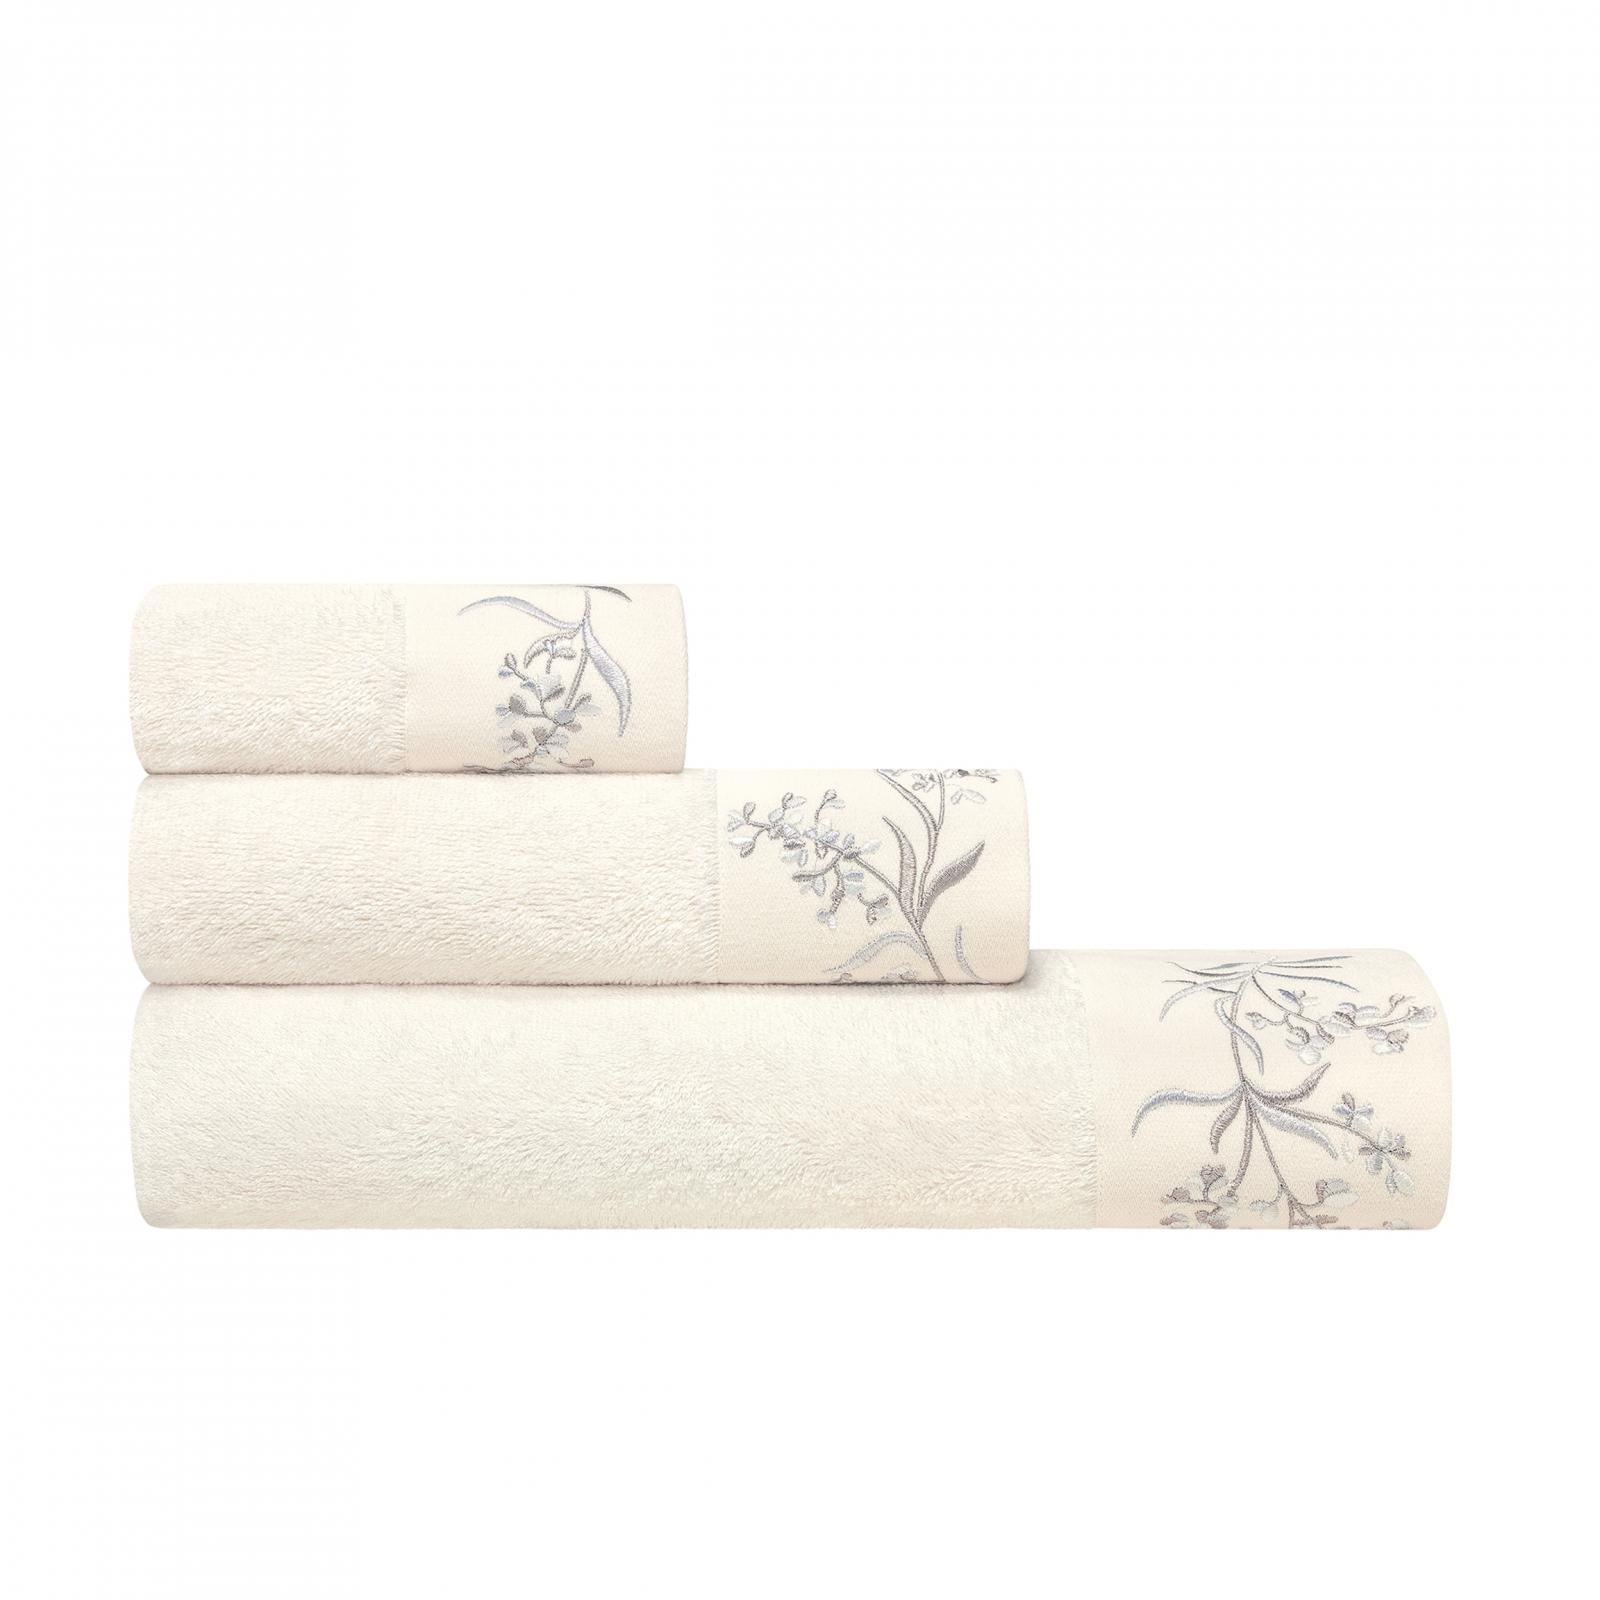 Фото - Комплект полотенец Togas соланж экрю 3 предмета 40х60/50х100/70х140 комплект полотенец togas миэль темно серый 2 пр 50х100 70х140